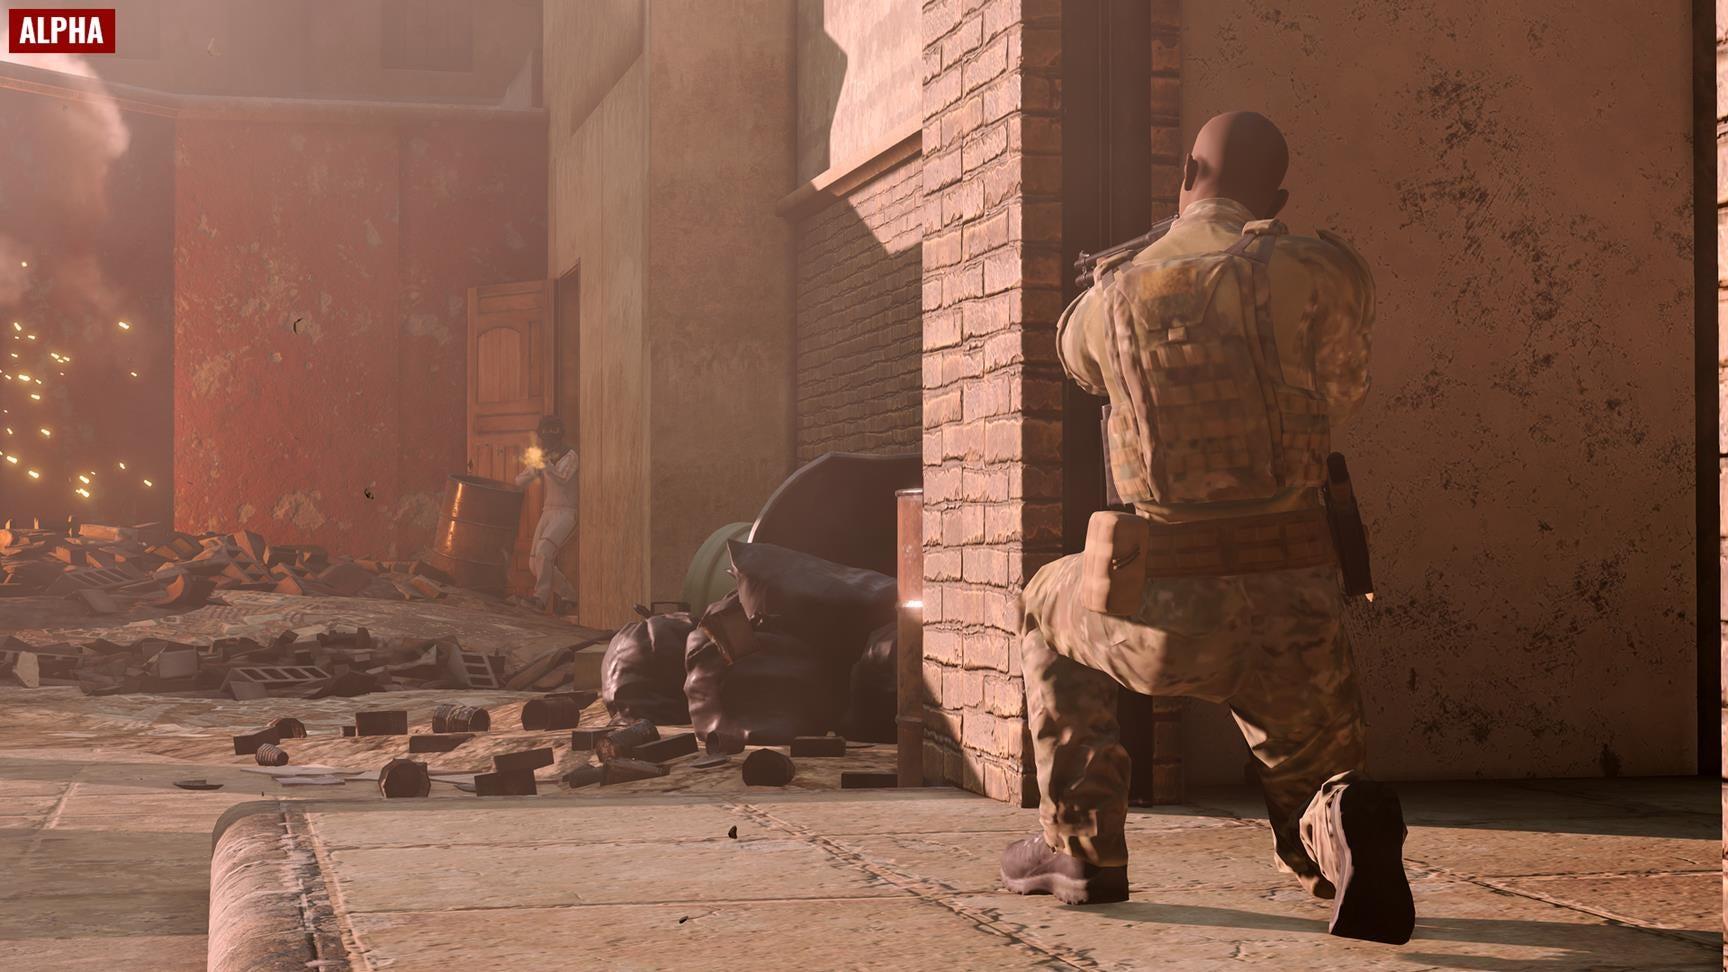 Image for Large update to Insurgency: Sandstorm pre-order beta coming next week